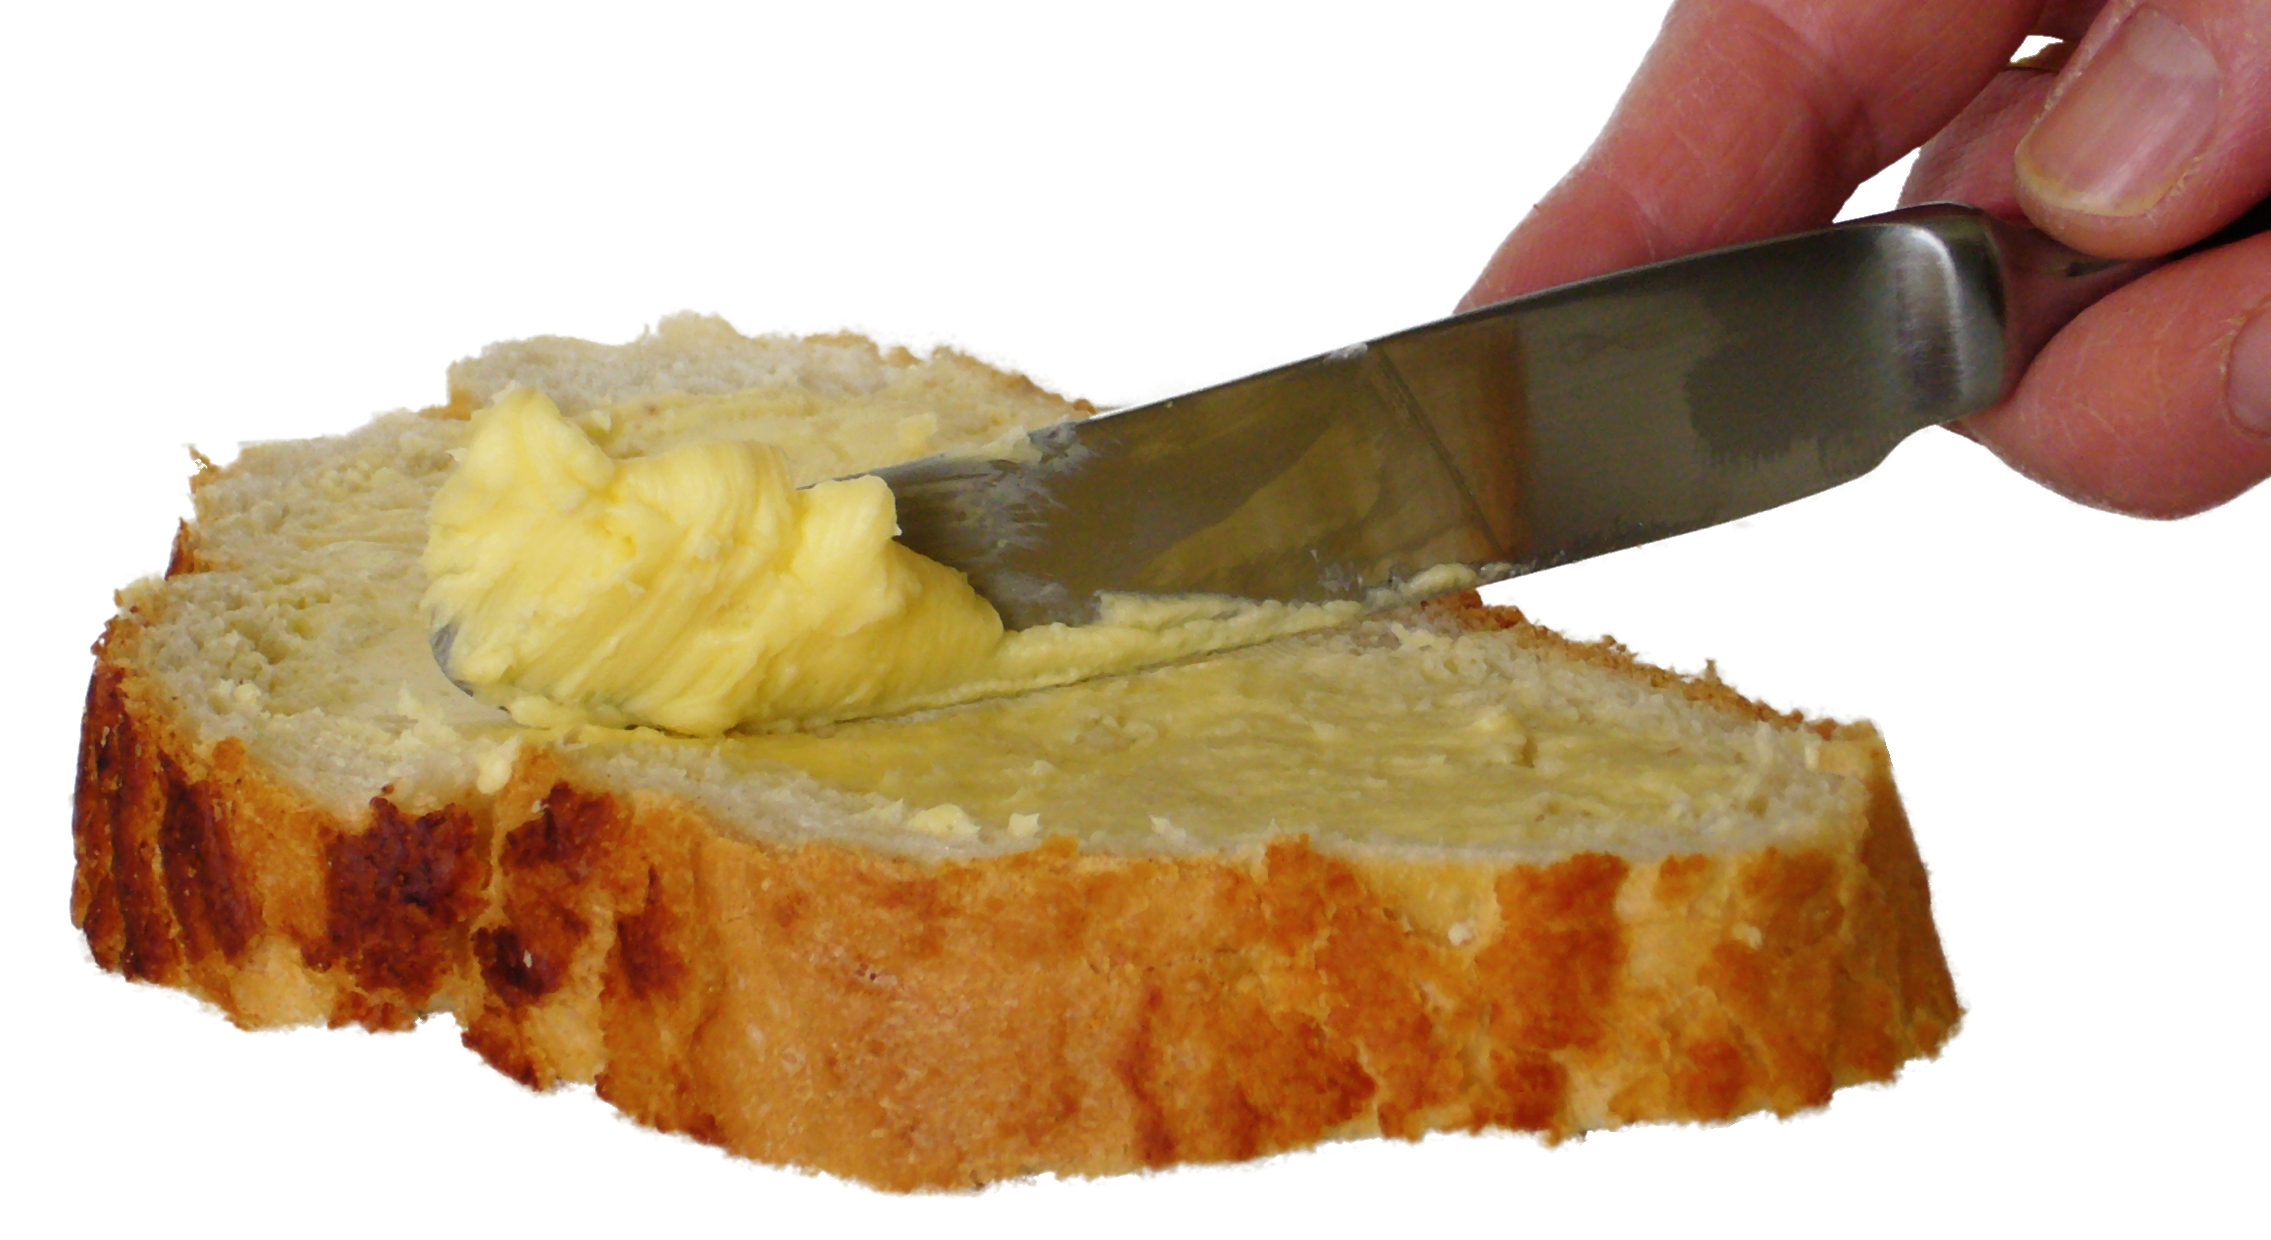 lätta smör kcal